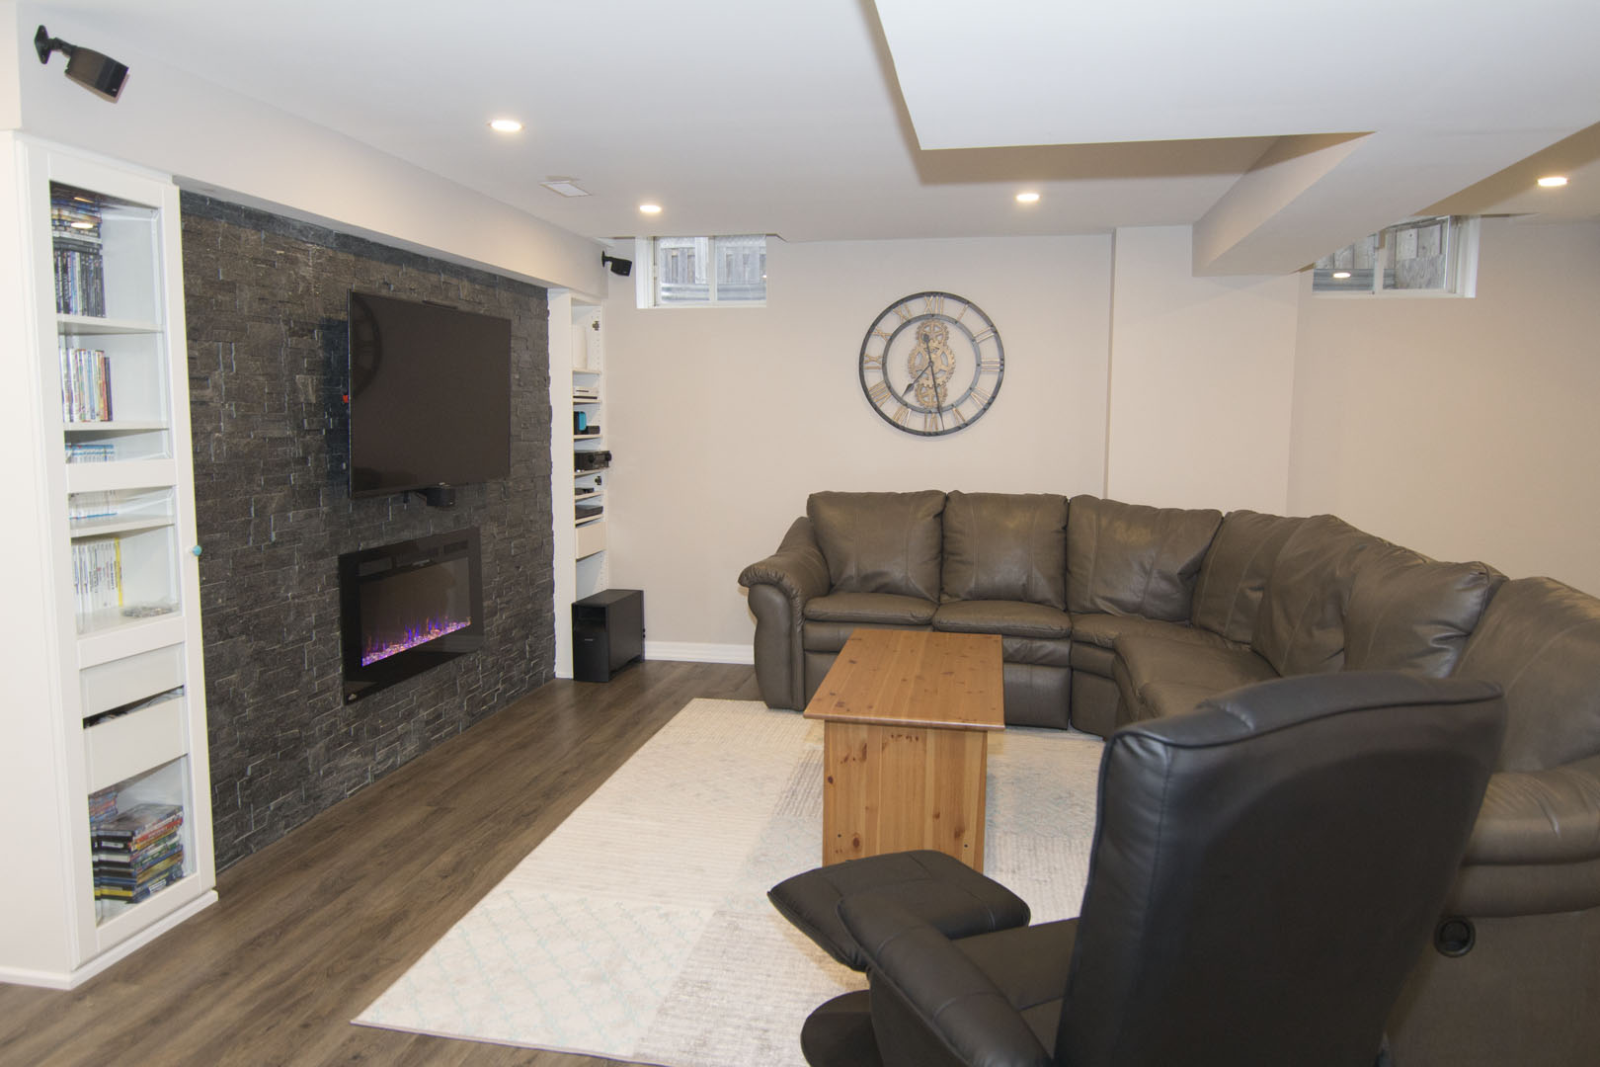 Basement-reno-tv-fireplace-oakville